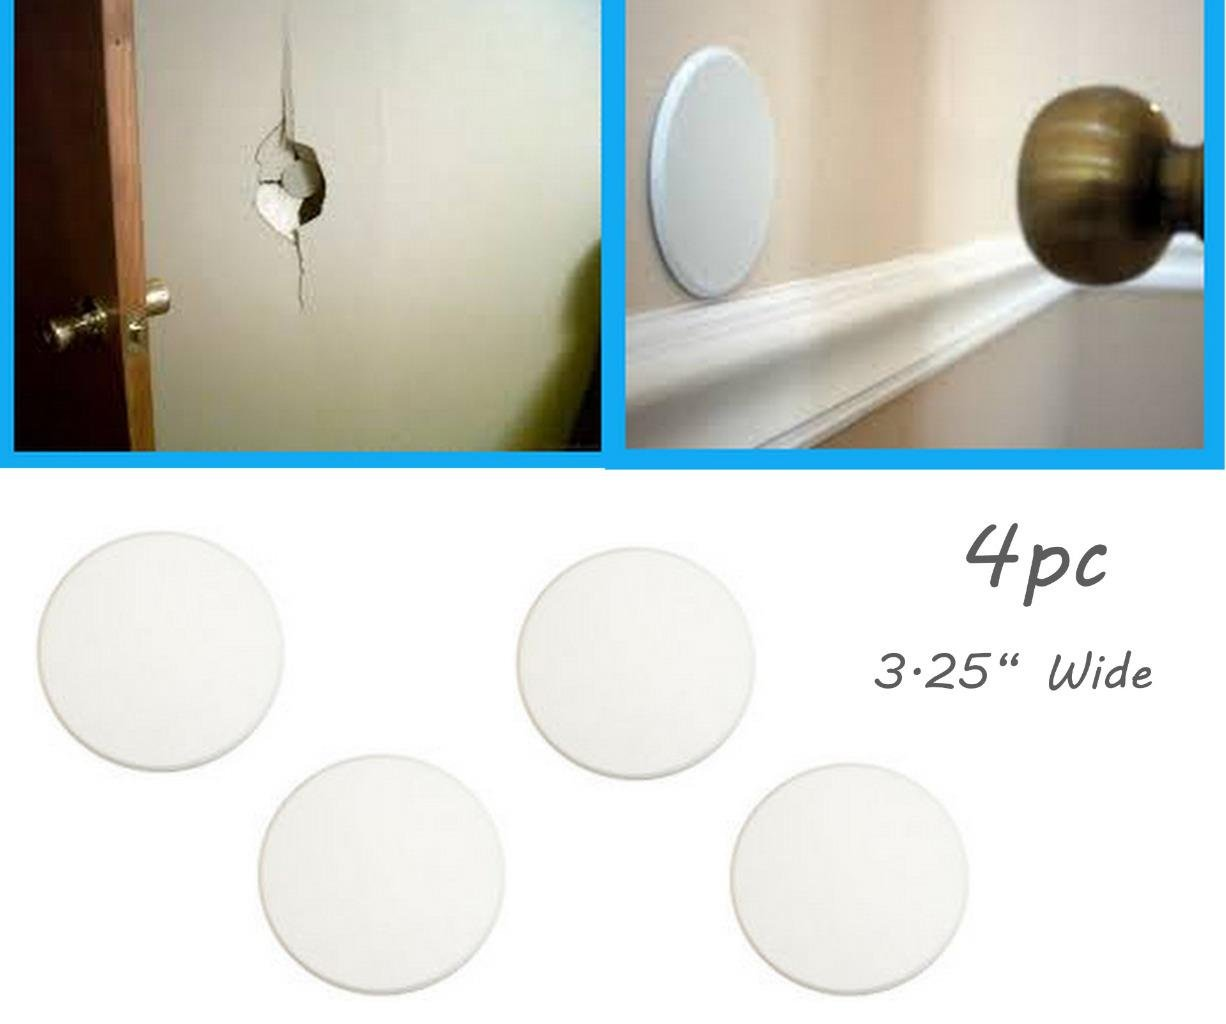 Amazoncom 4pc ALAZCO Door Knob Wall Protector Shield Plates